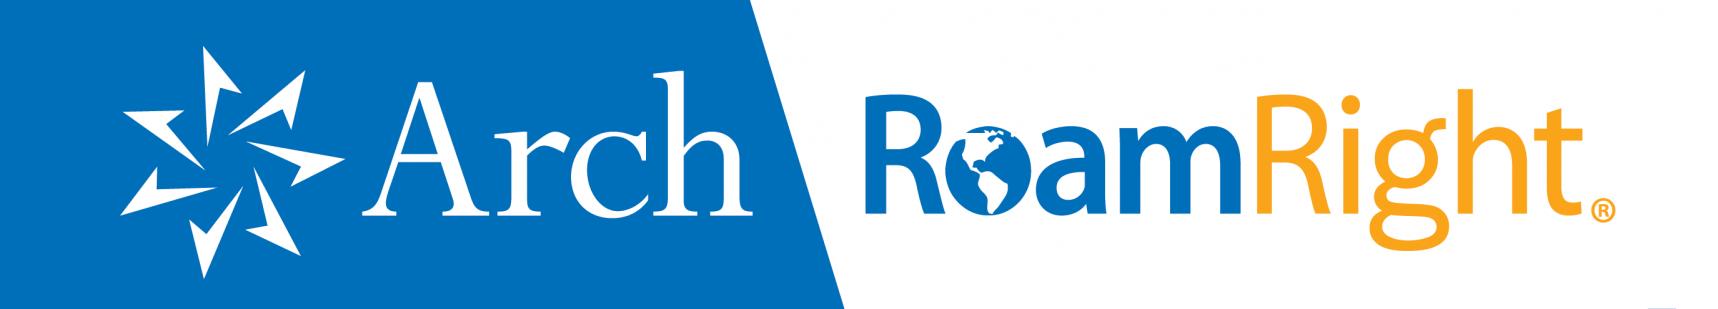 Arch RoamRight Logo